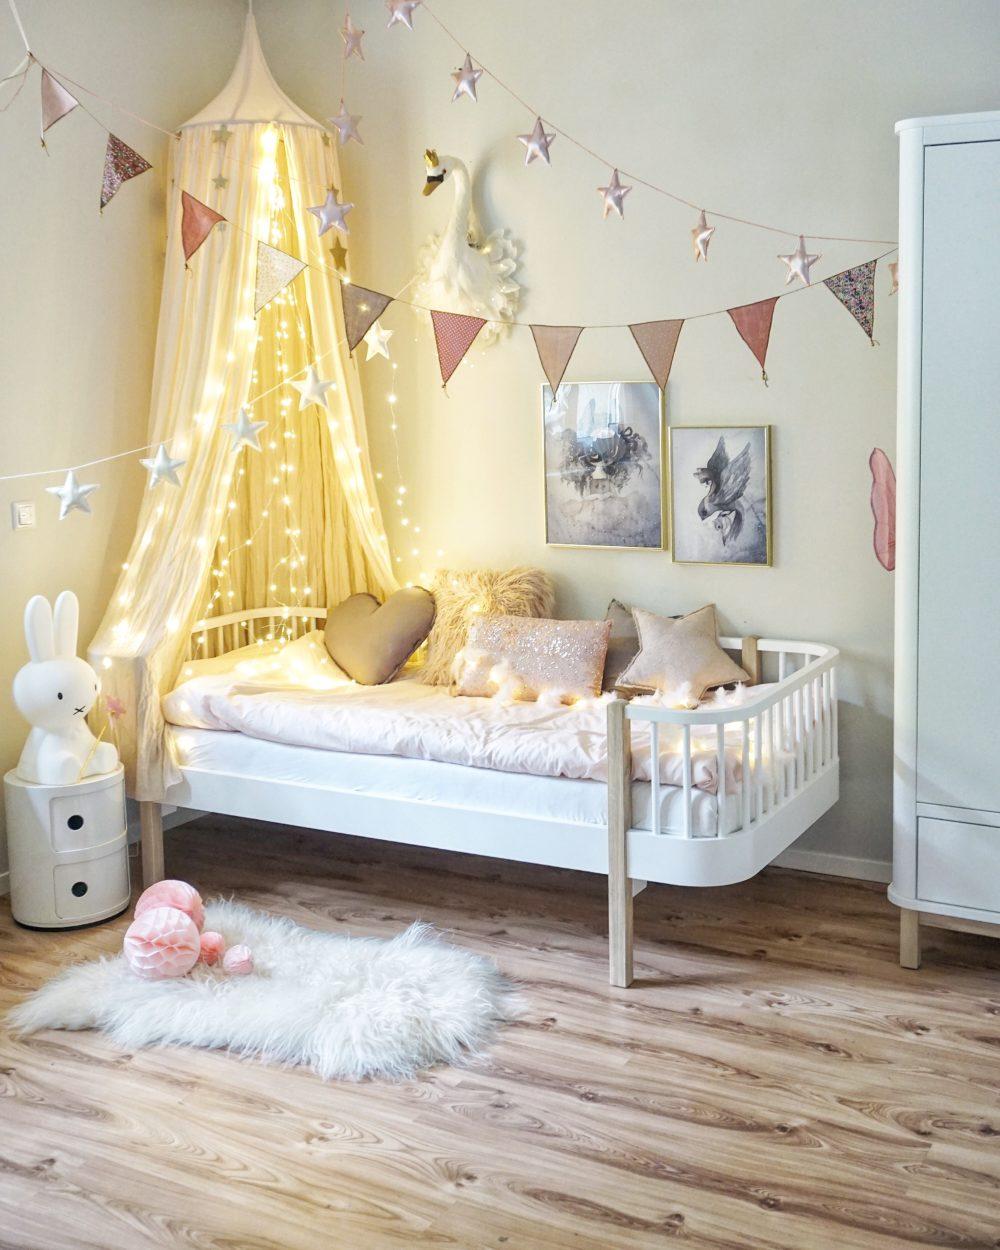 Mädchen Kinderzimmer Kinderbett Oliverfurniture bei Easyinterieur